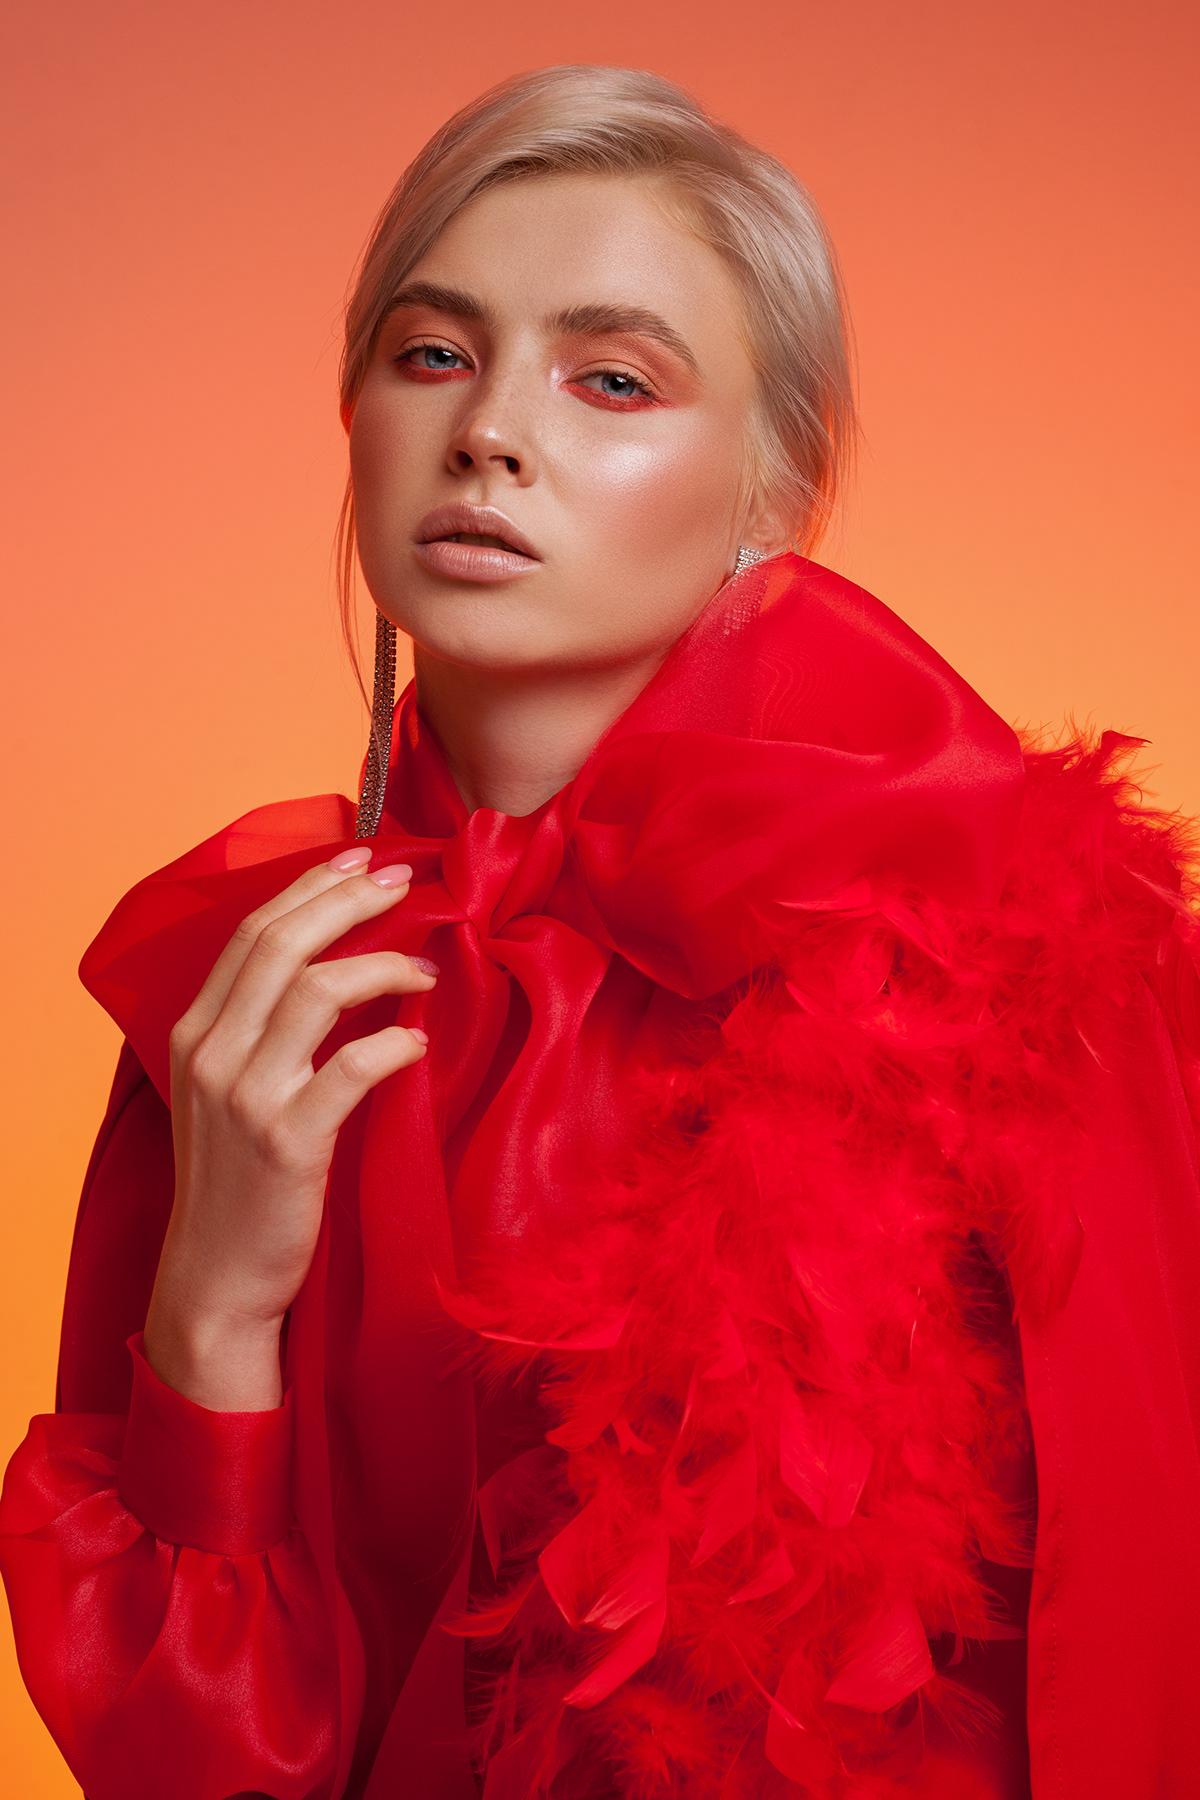 beauty red portrait Fashion  vogue editorial